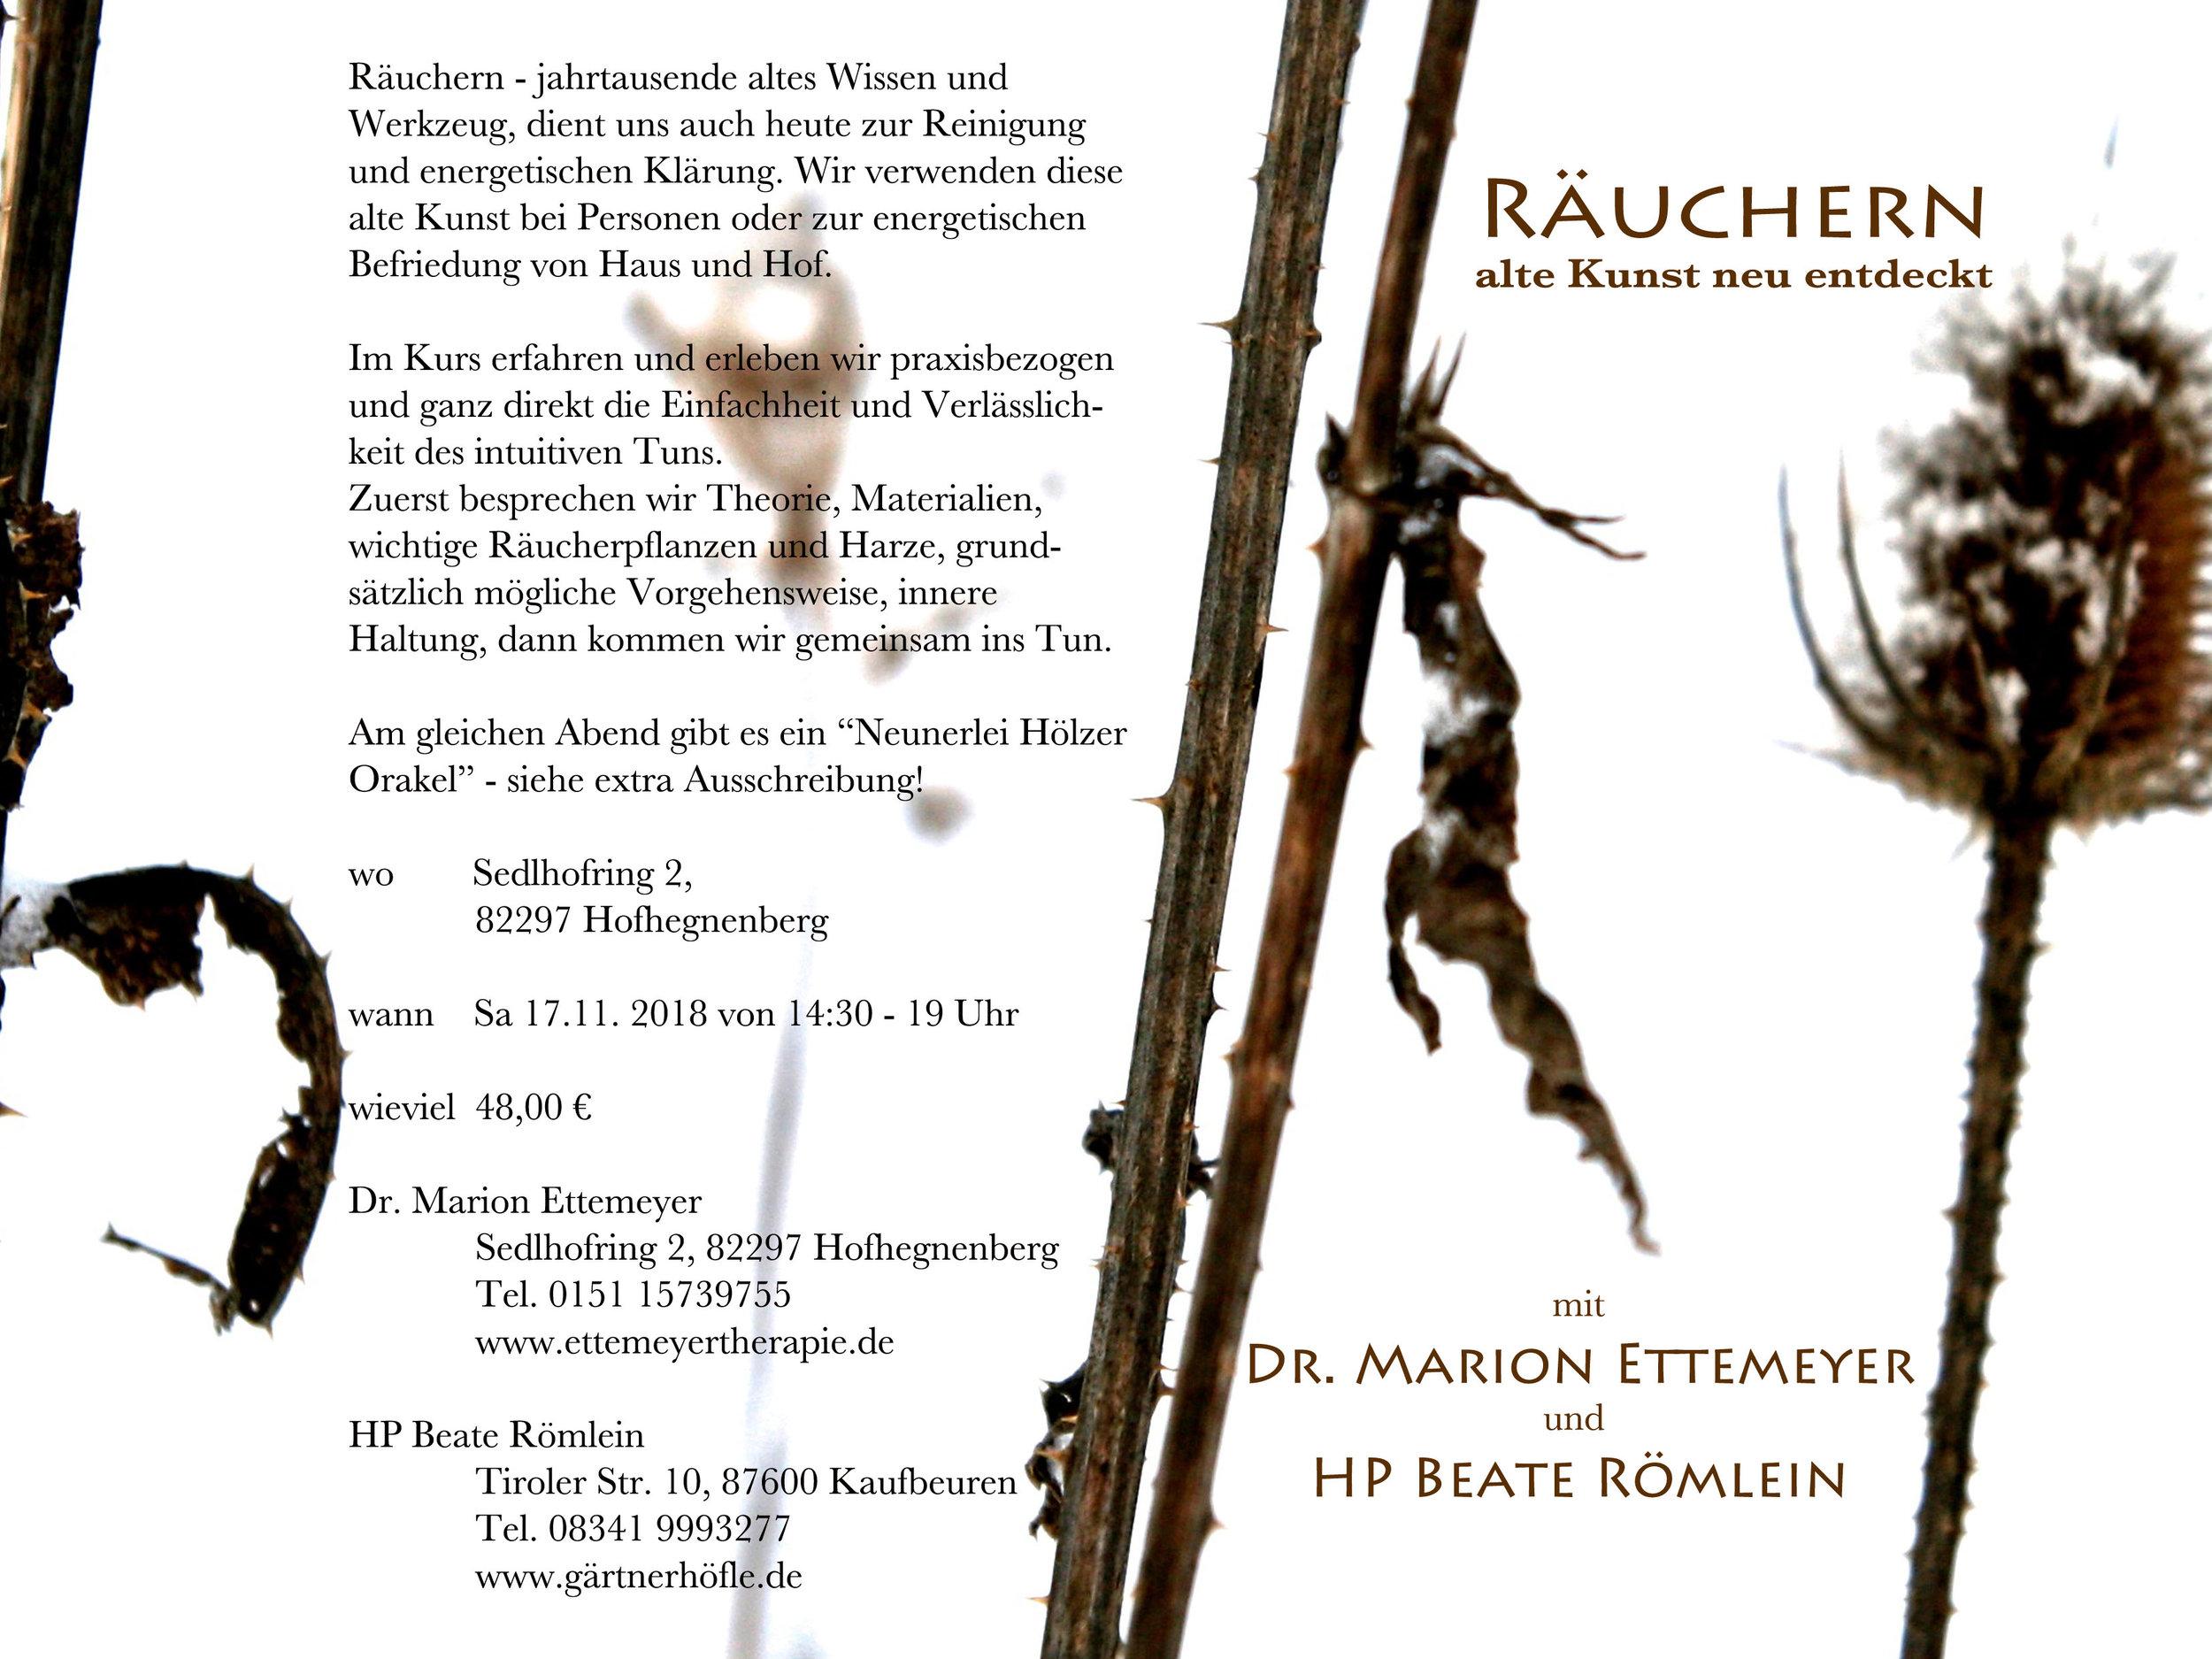 Räuchern3 Flyer 2018.jpg